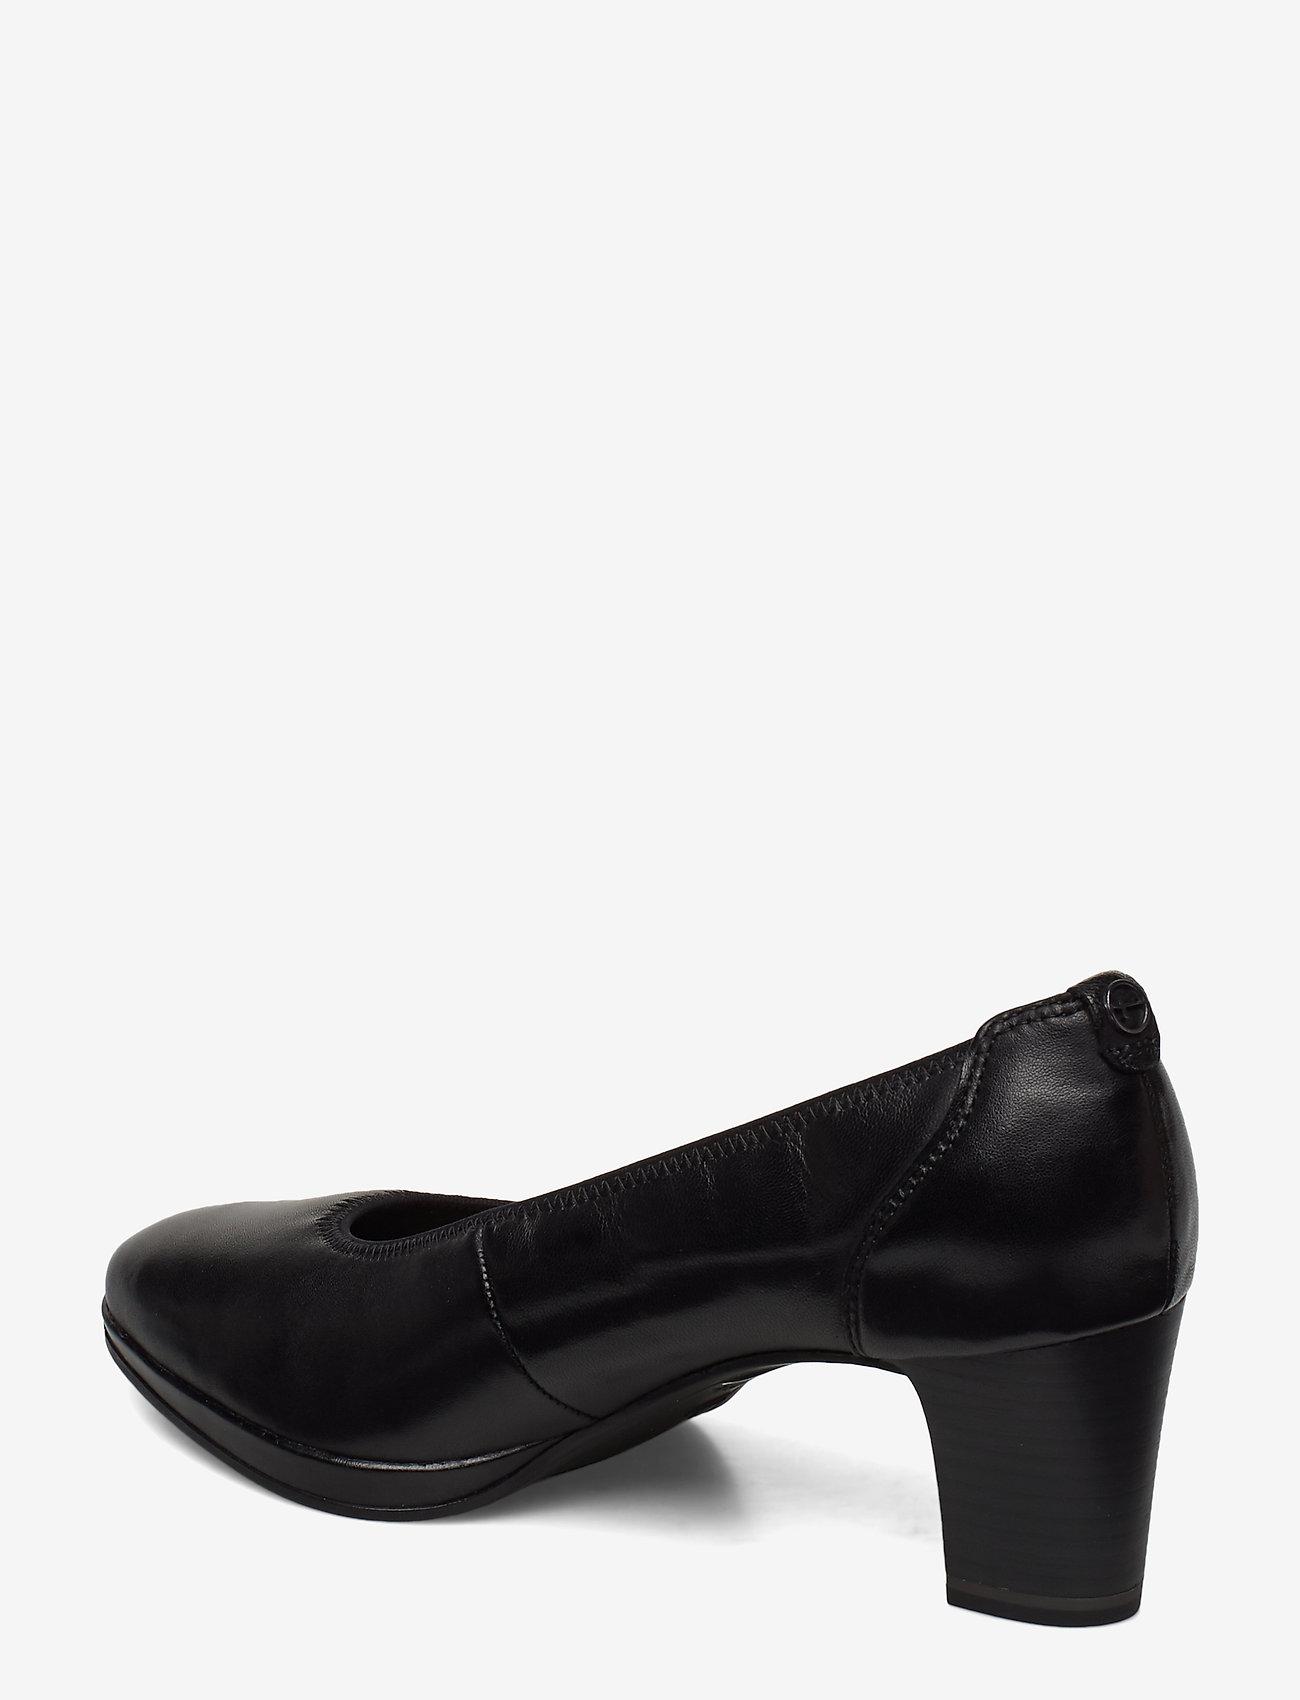 Woms Court Shoe (Black) (419.30 kr) - Tamaris